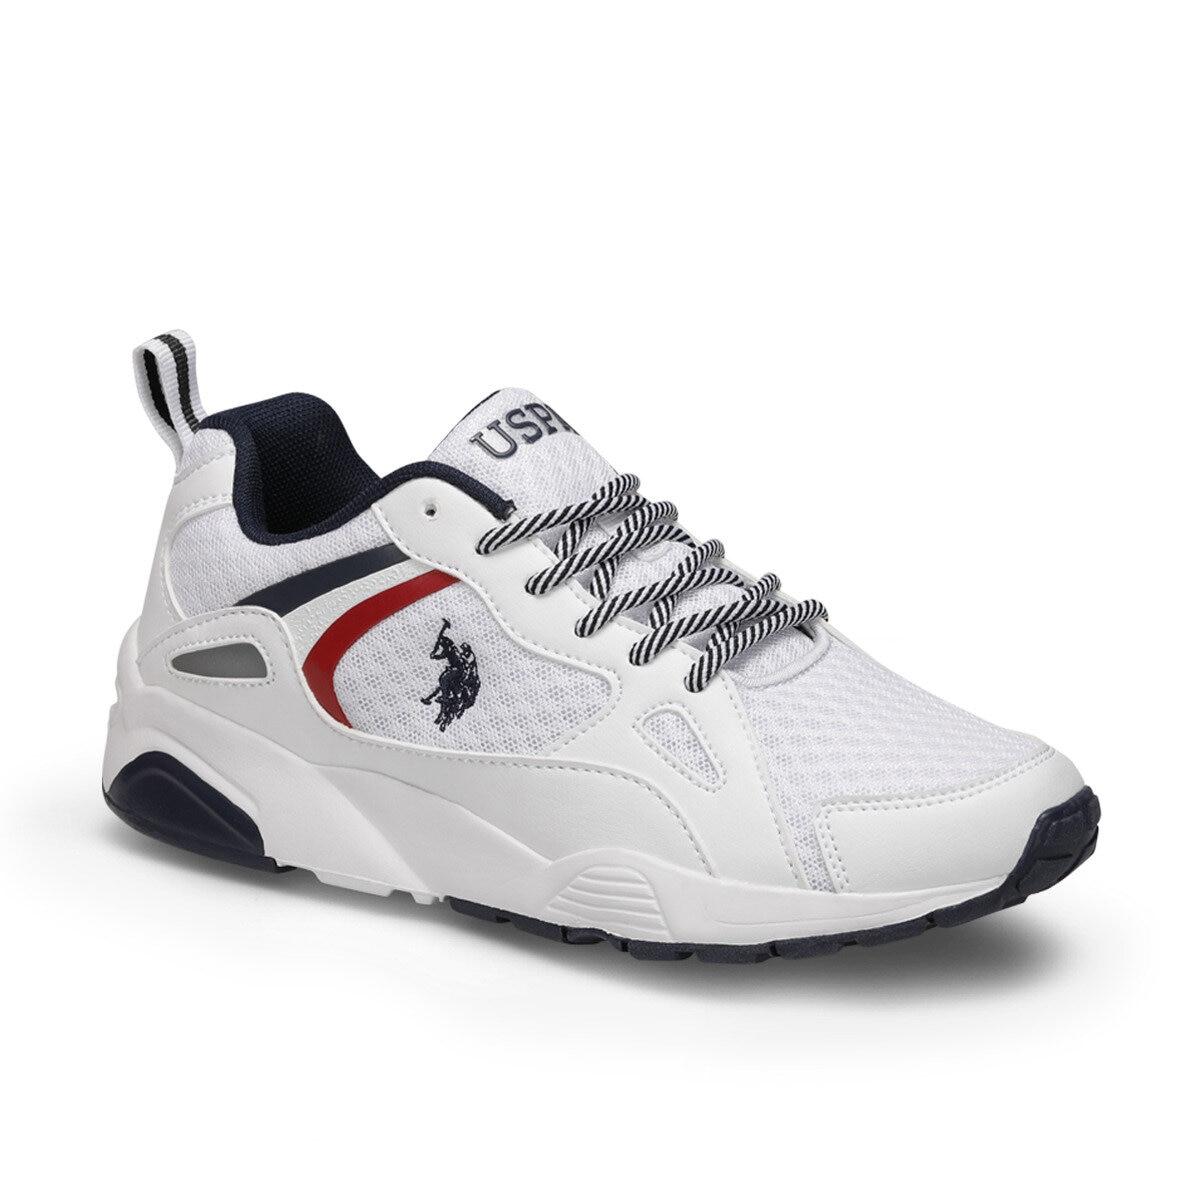 FLO BERLINGO White Women 'S Sneaker Shoes U.S. POLO ASSN.